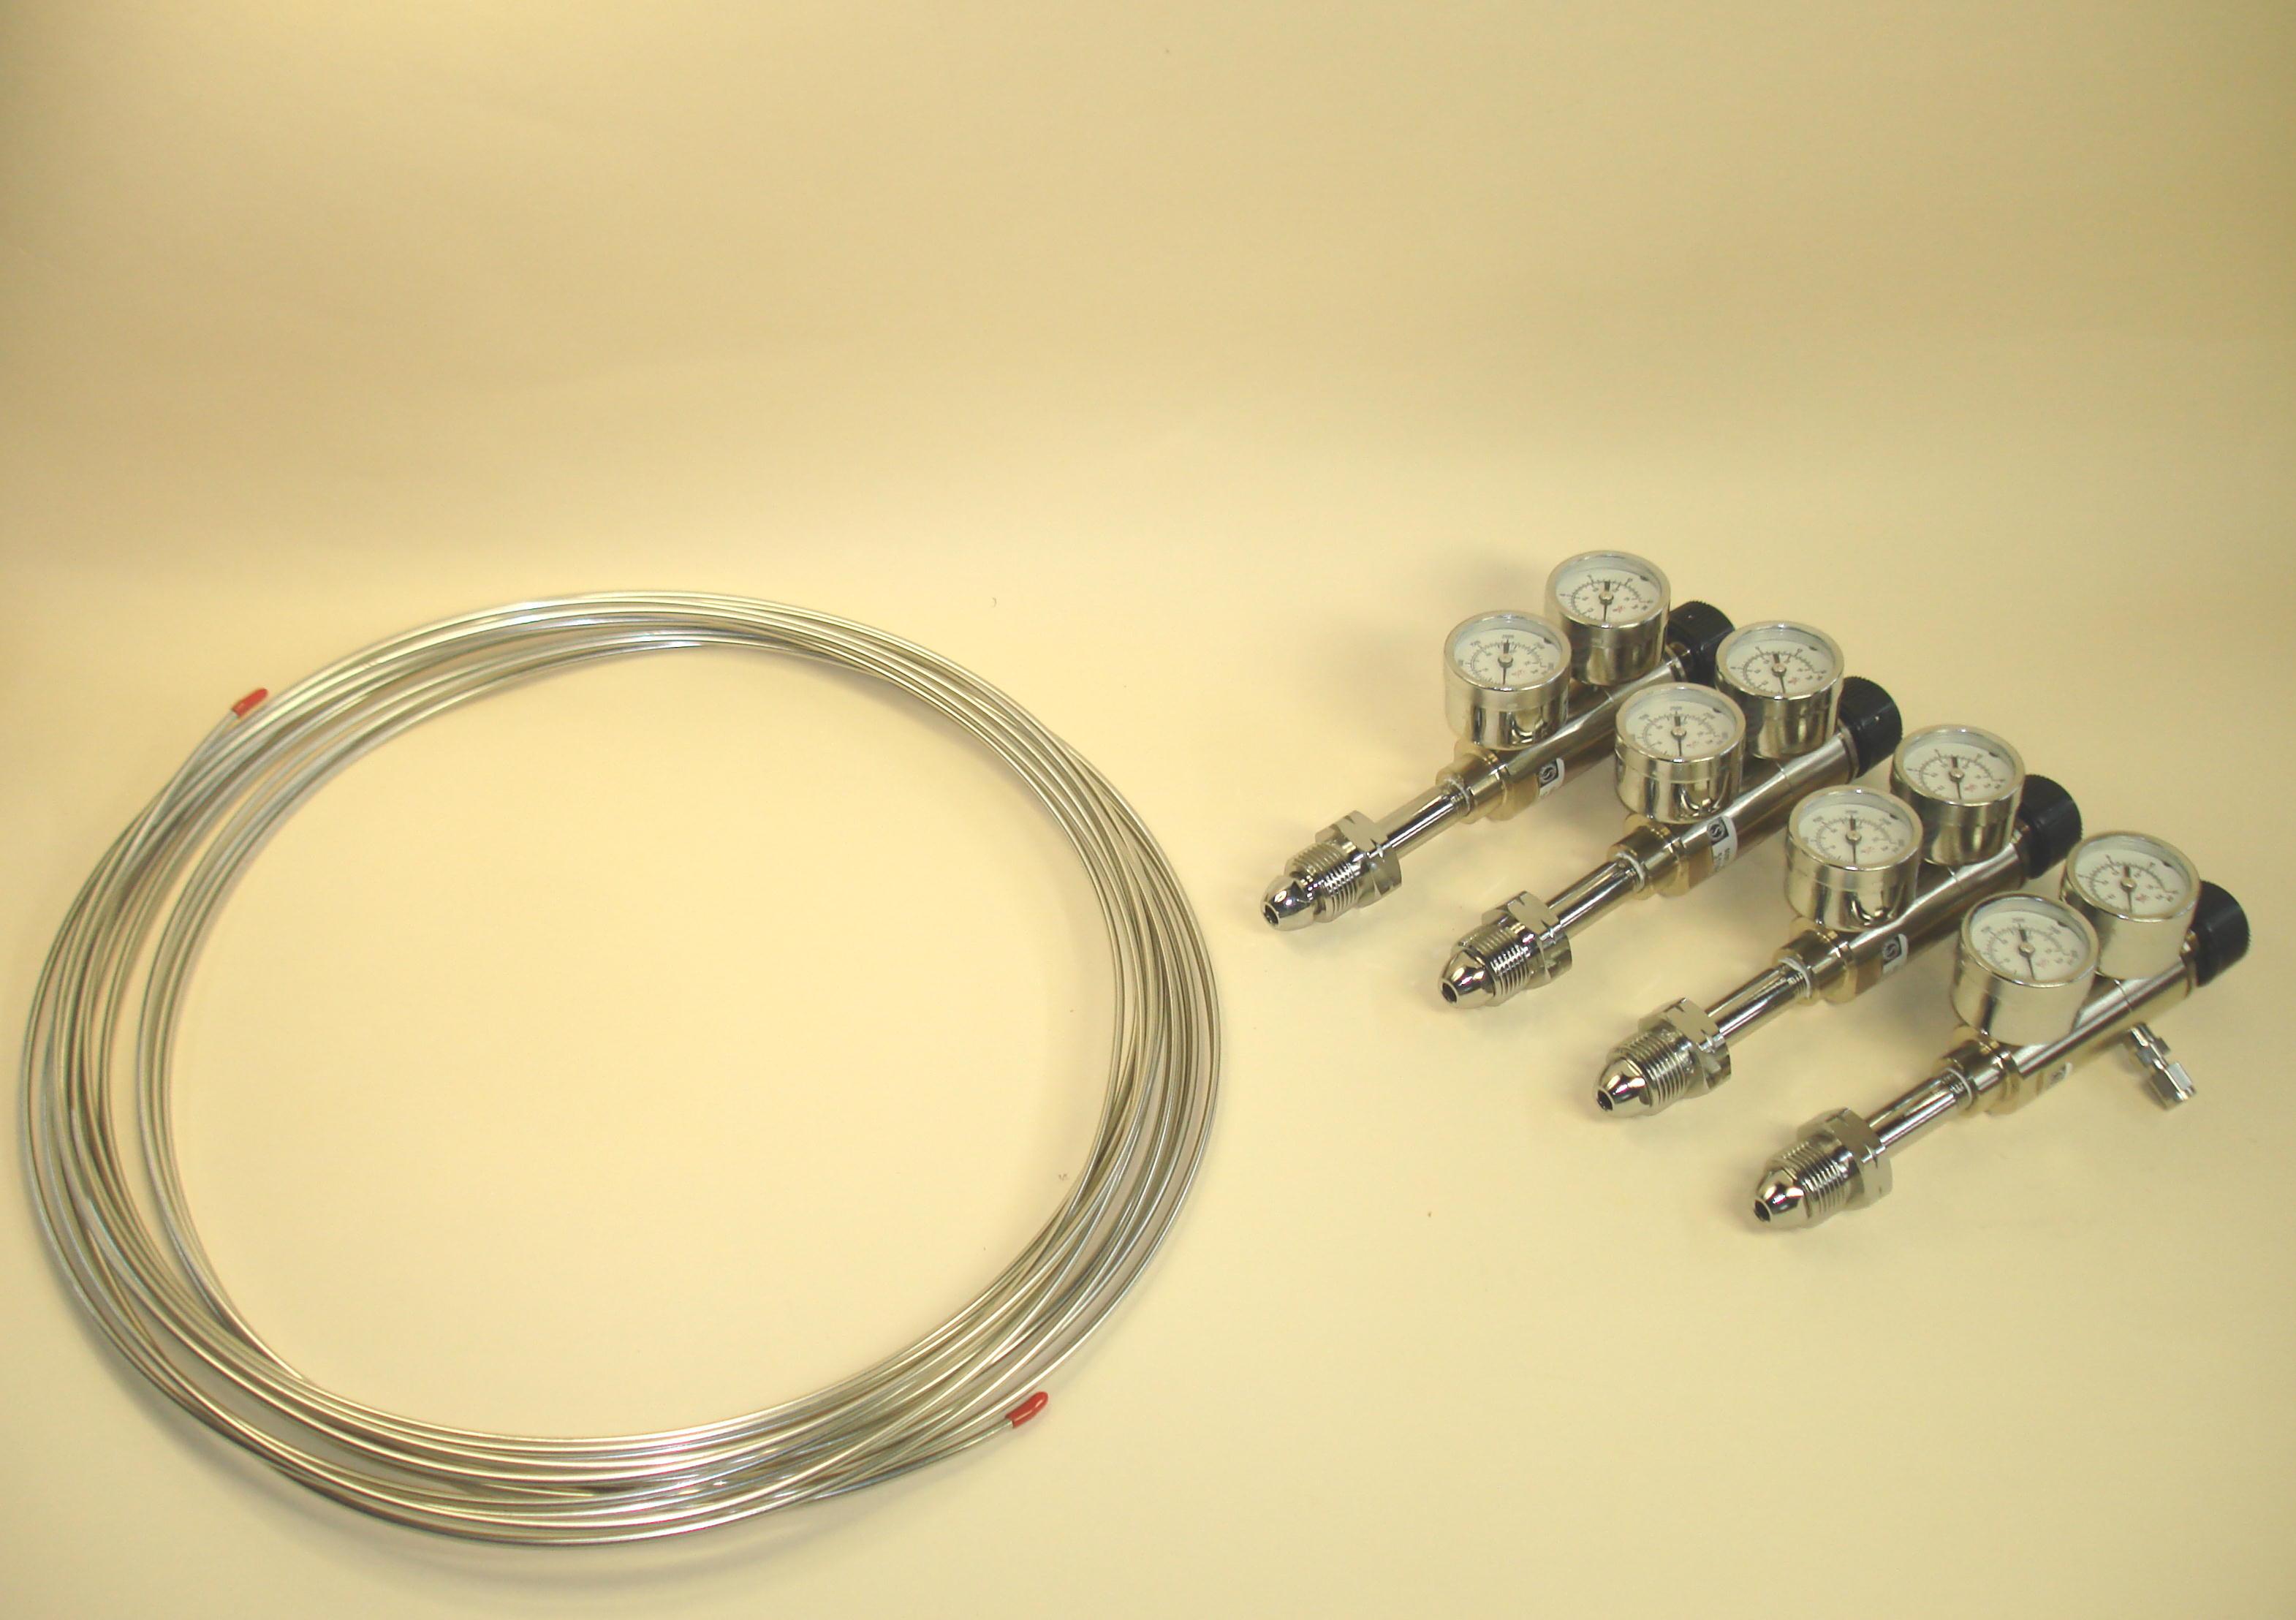 Kit, Gas Regulator w/ CGA 580 Fittings